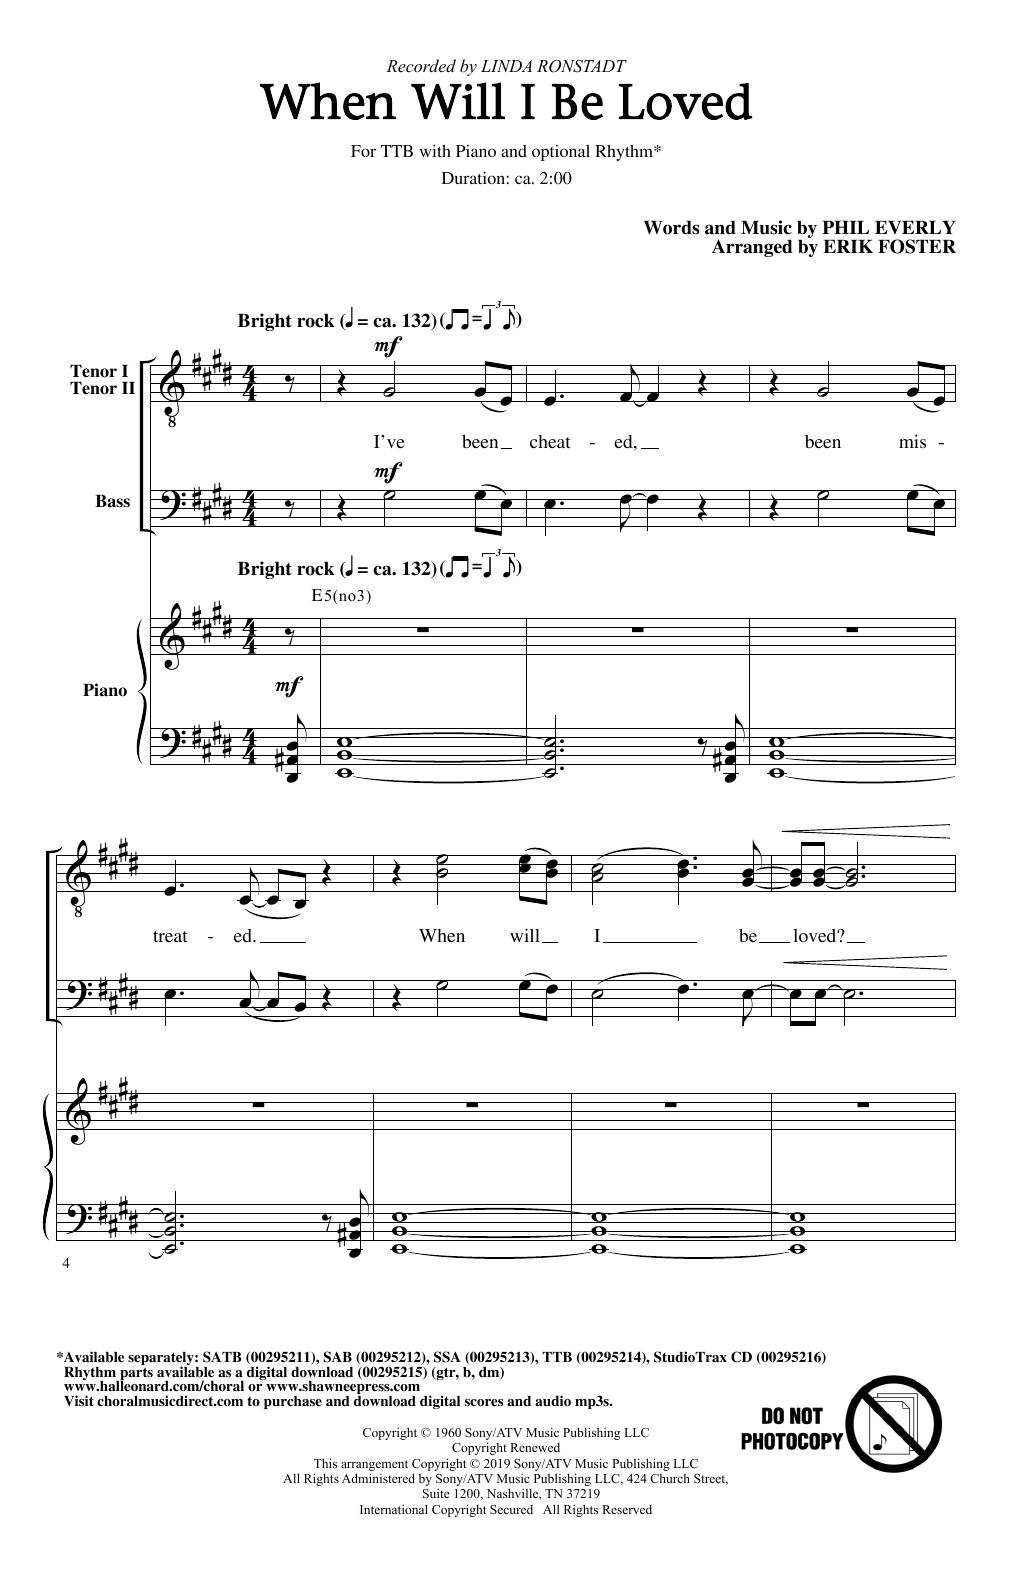 When Will I Be Loved (arr. Erik Foster) (TTBB Choir)